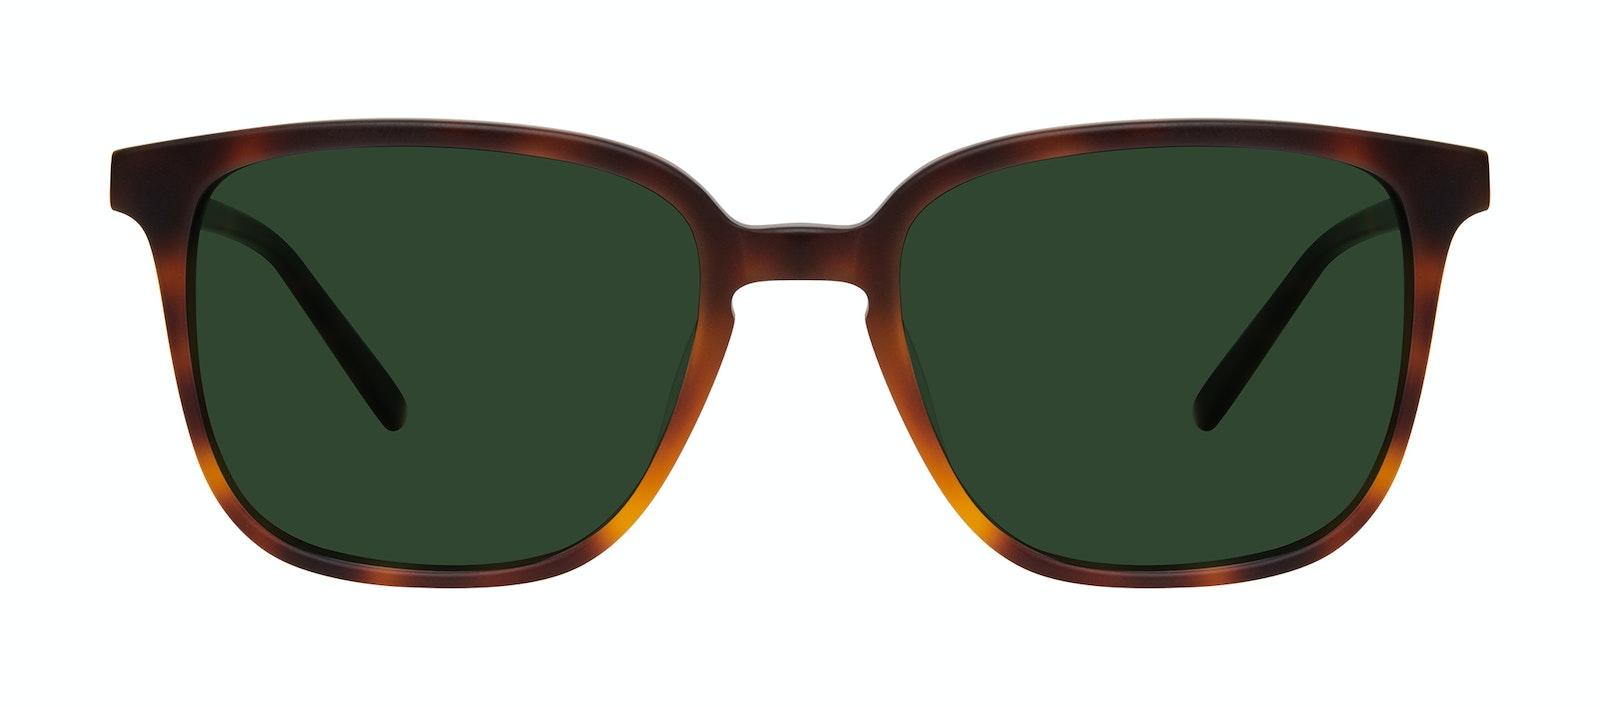 Affordable Fashion Glasses Square Sunglasses Men Fellow Matte Tortoise Front